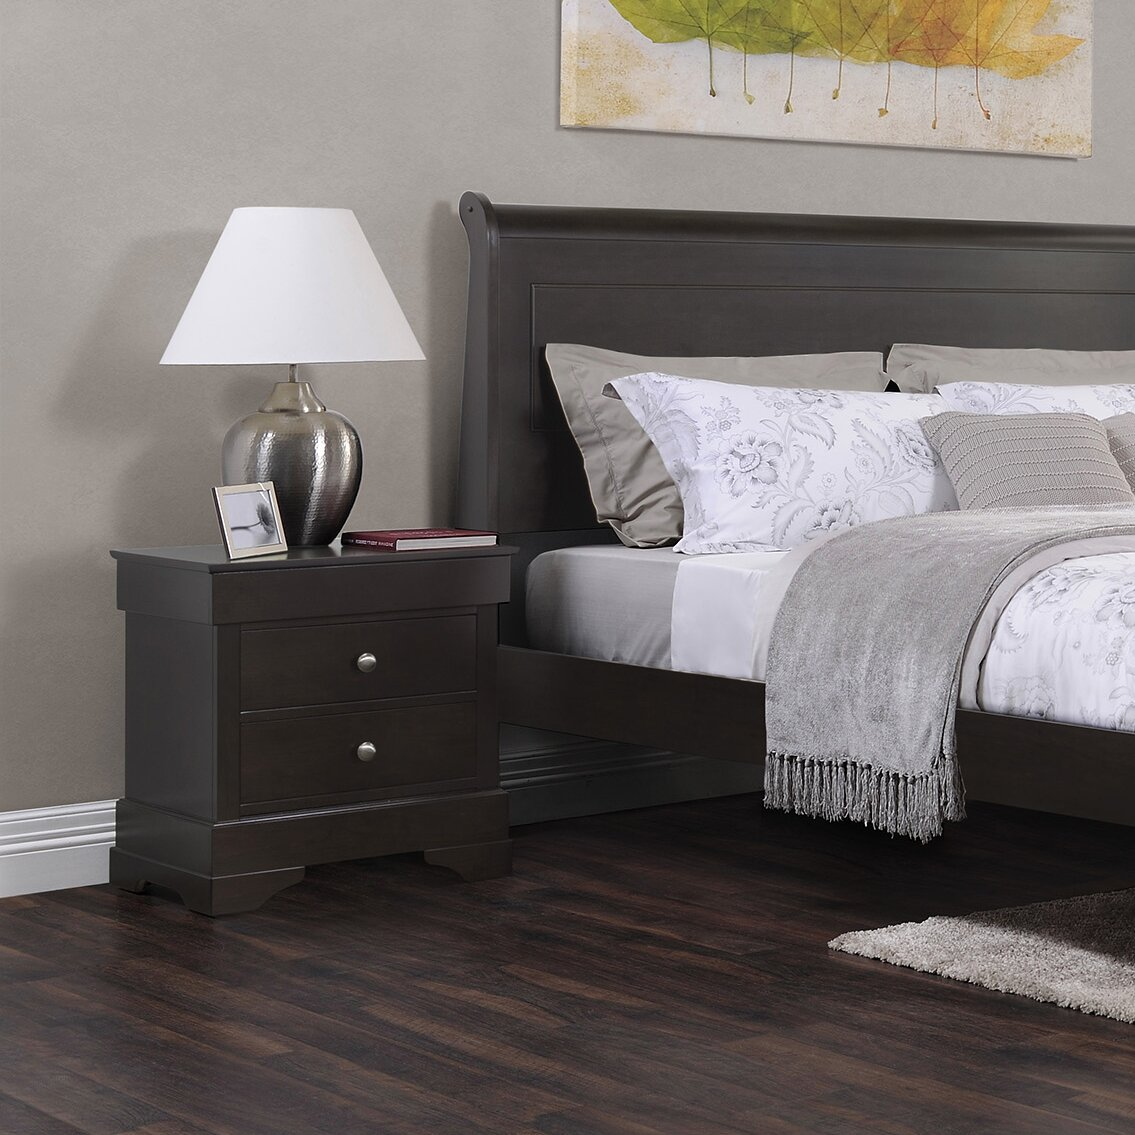 4 pc mcferran furniture b1500 manhattan bedroom set. manhattan ...